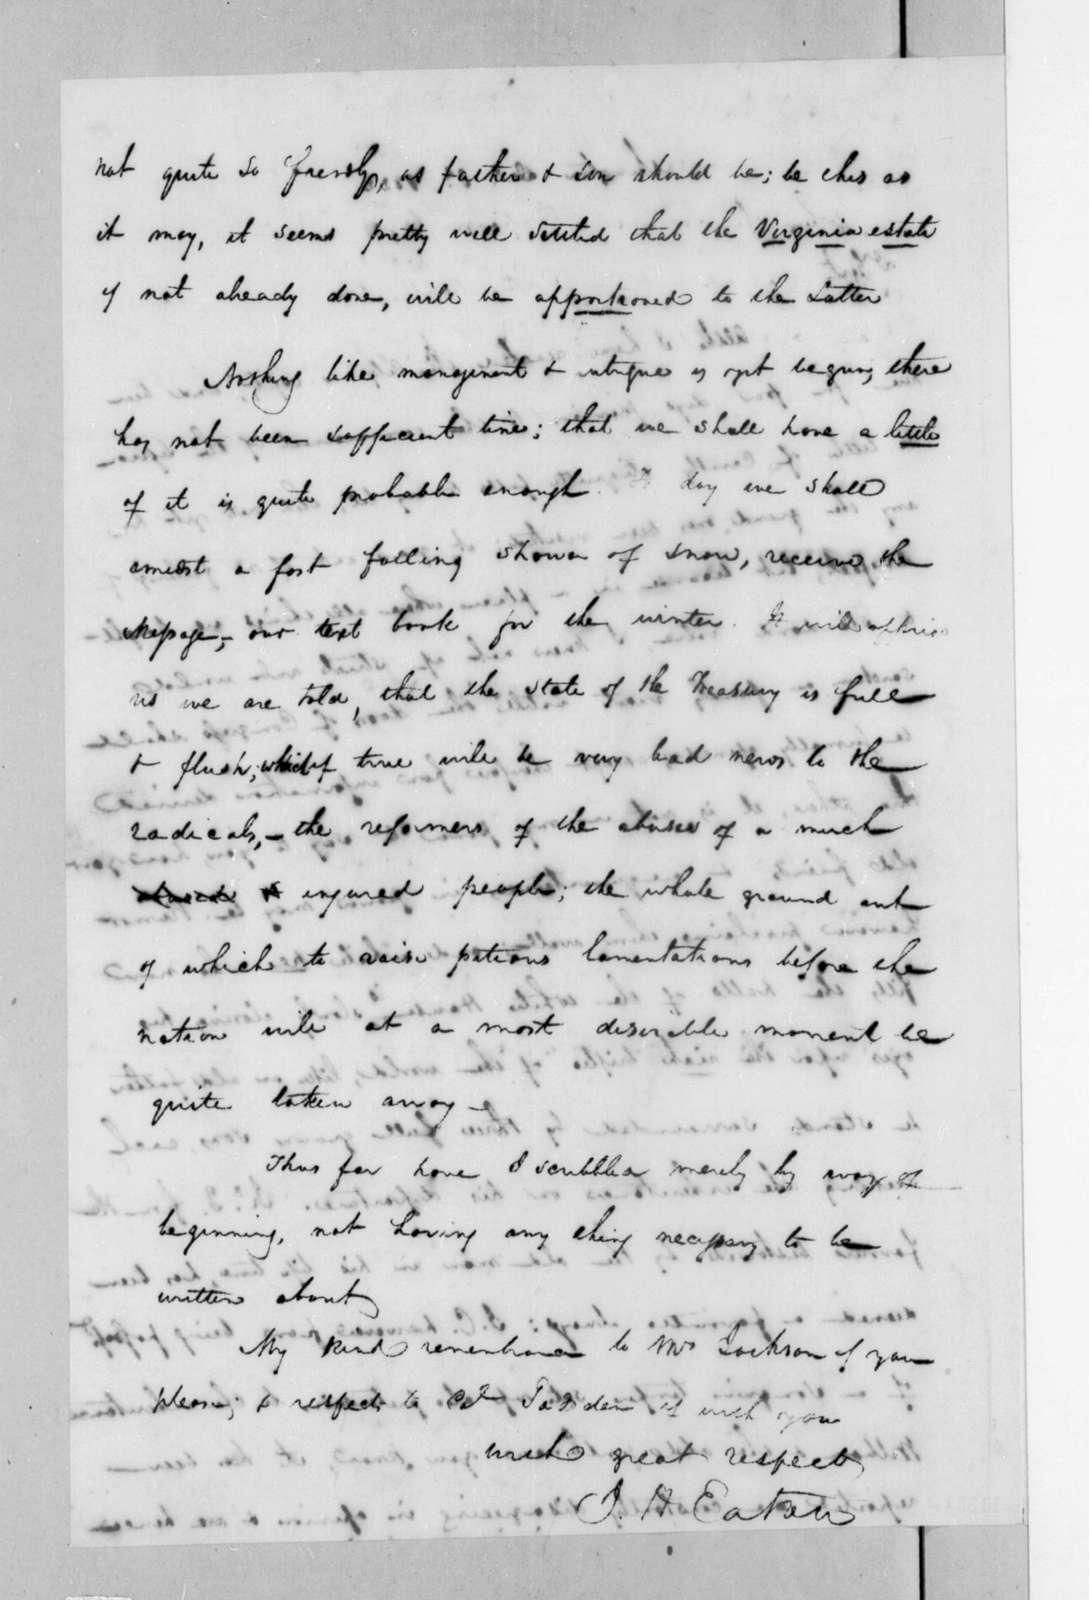 Joseph W. McKean to Andrew Jackson, December 2, 1822